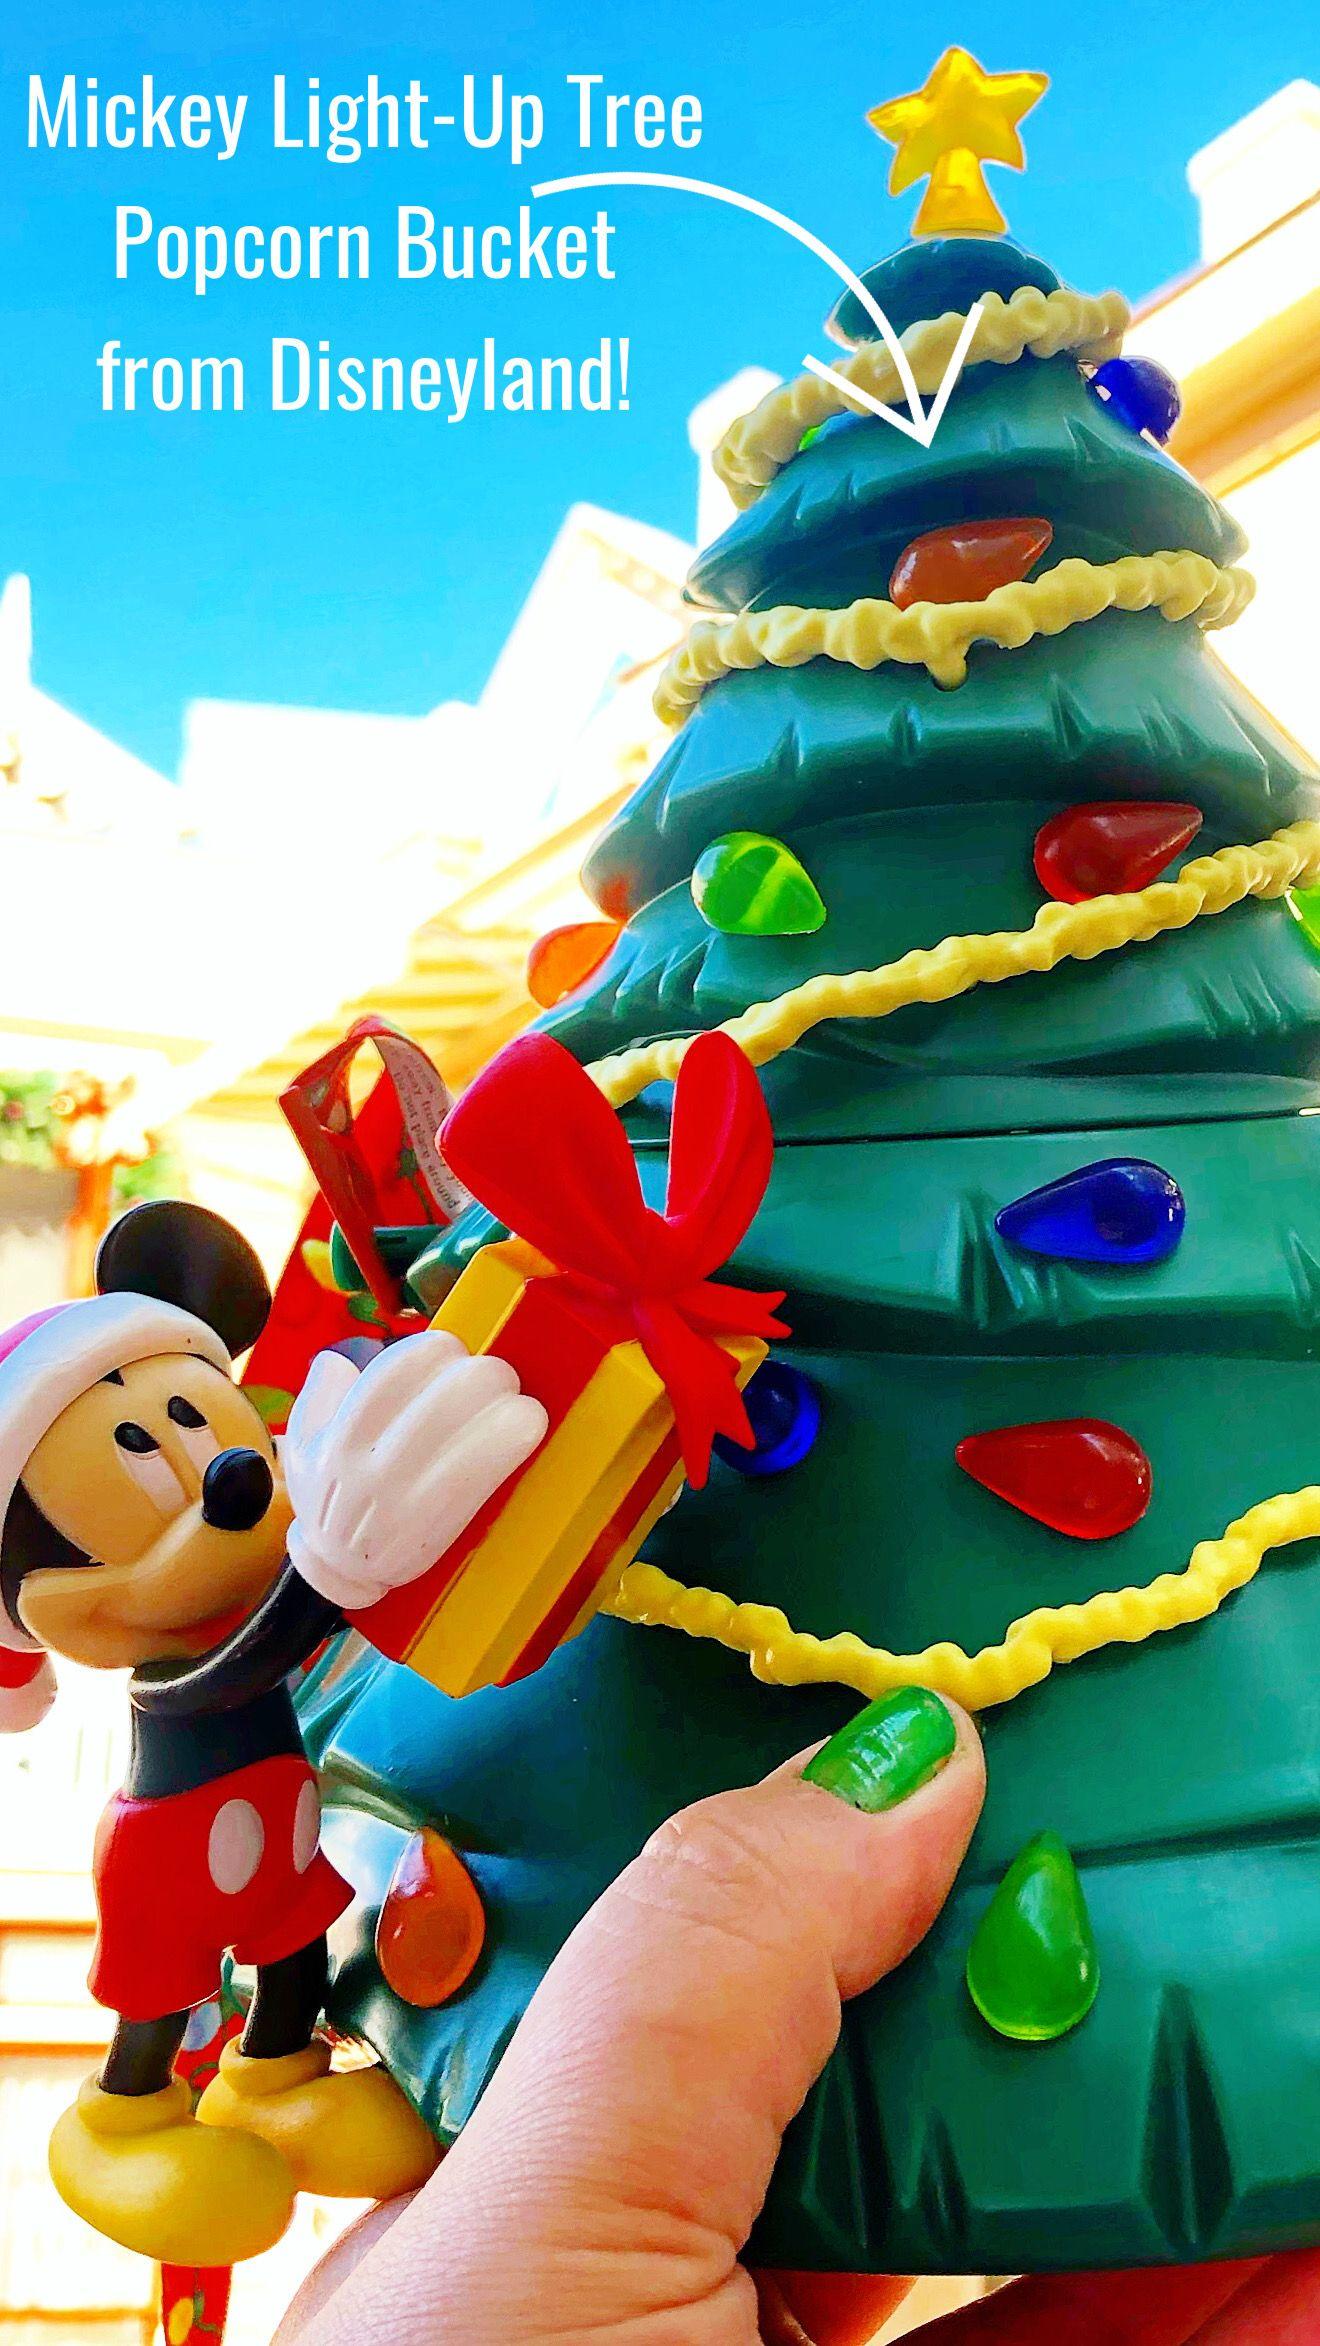 Mickey Light-Up Tree Popcorn Bucket | Disney popcorn bucket, Disney halloween, Popcorn bucket